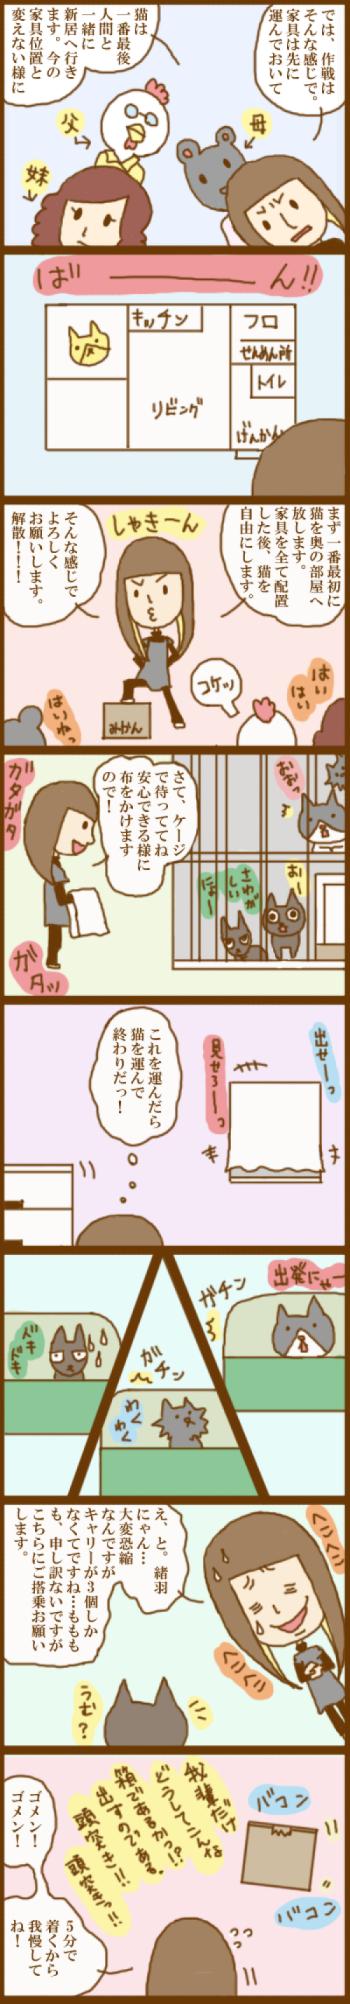 f:id:suzuokayu:20201117093026j:plain